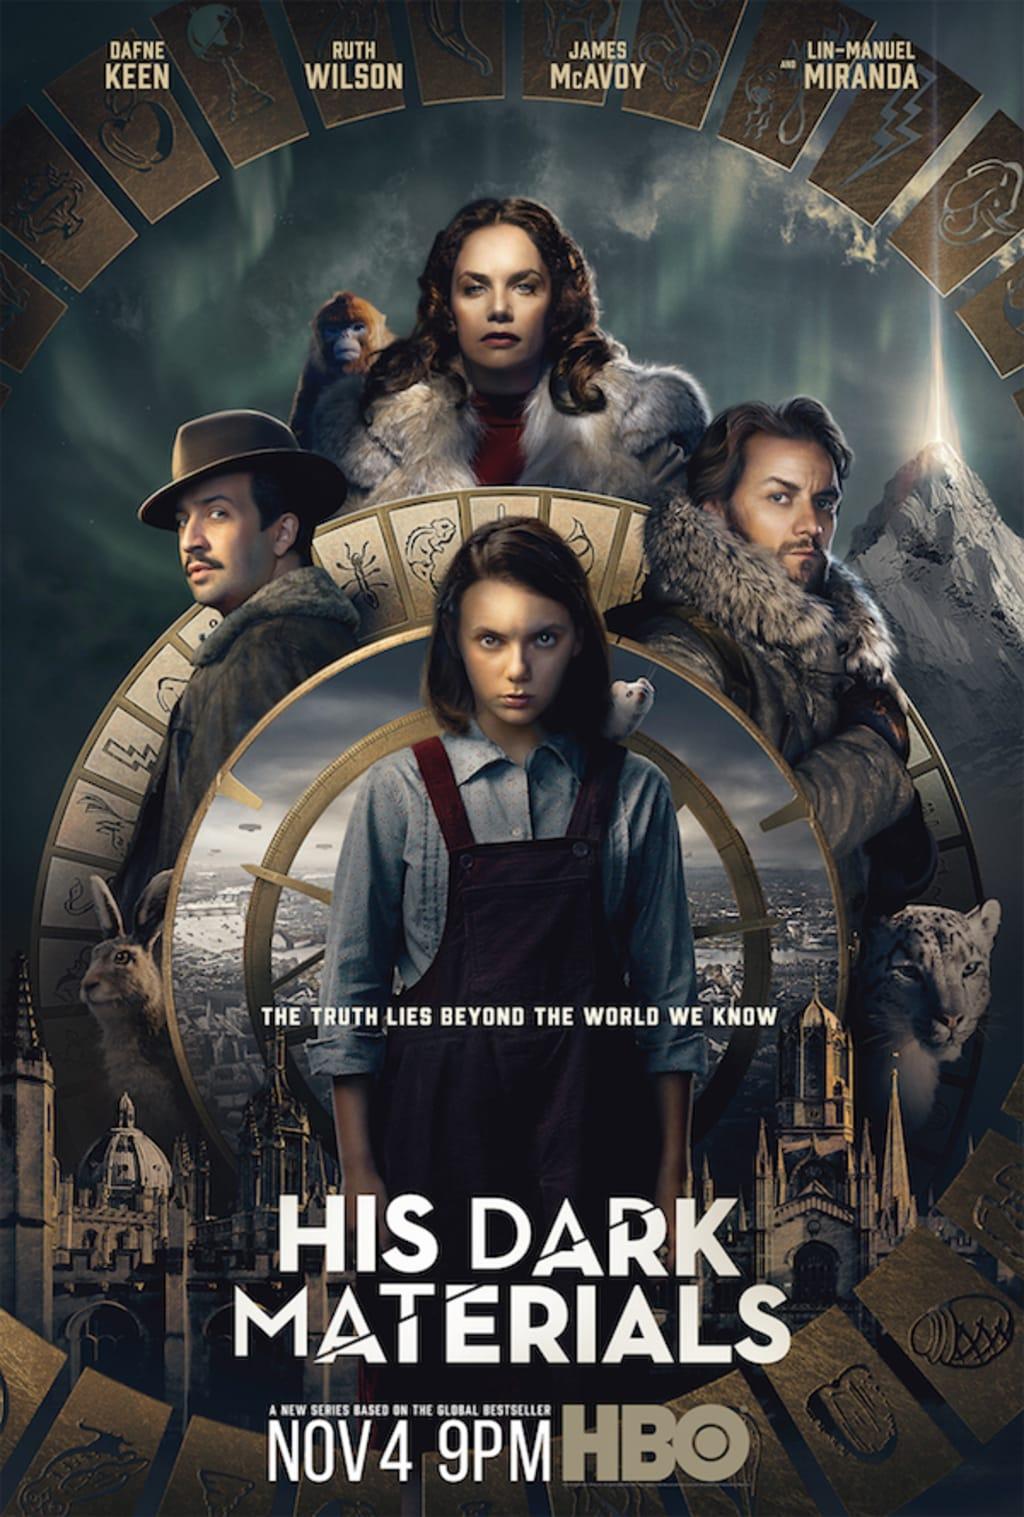 Review of 'His Dark Materials' 1.3